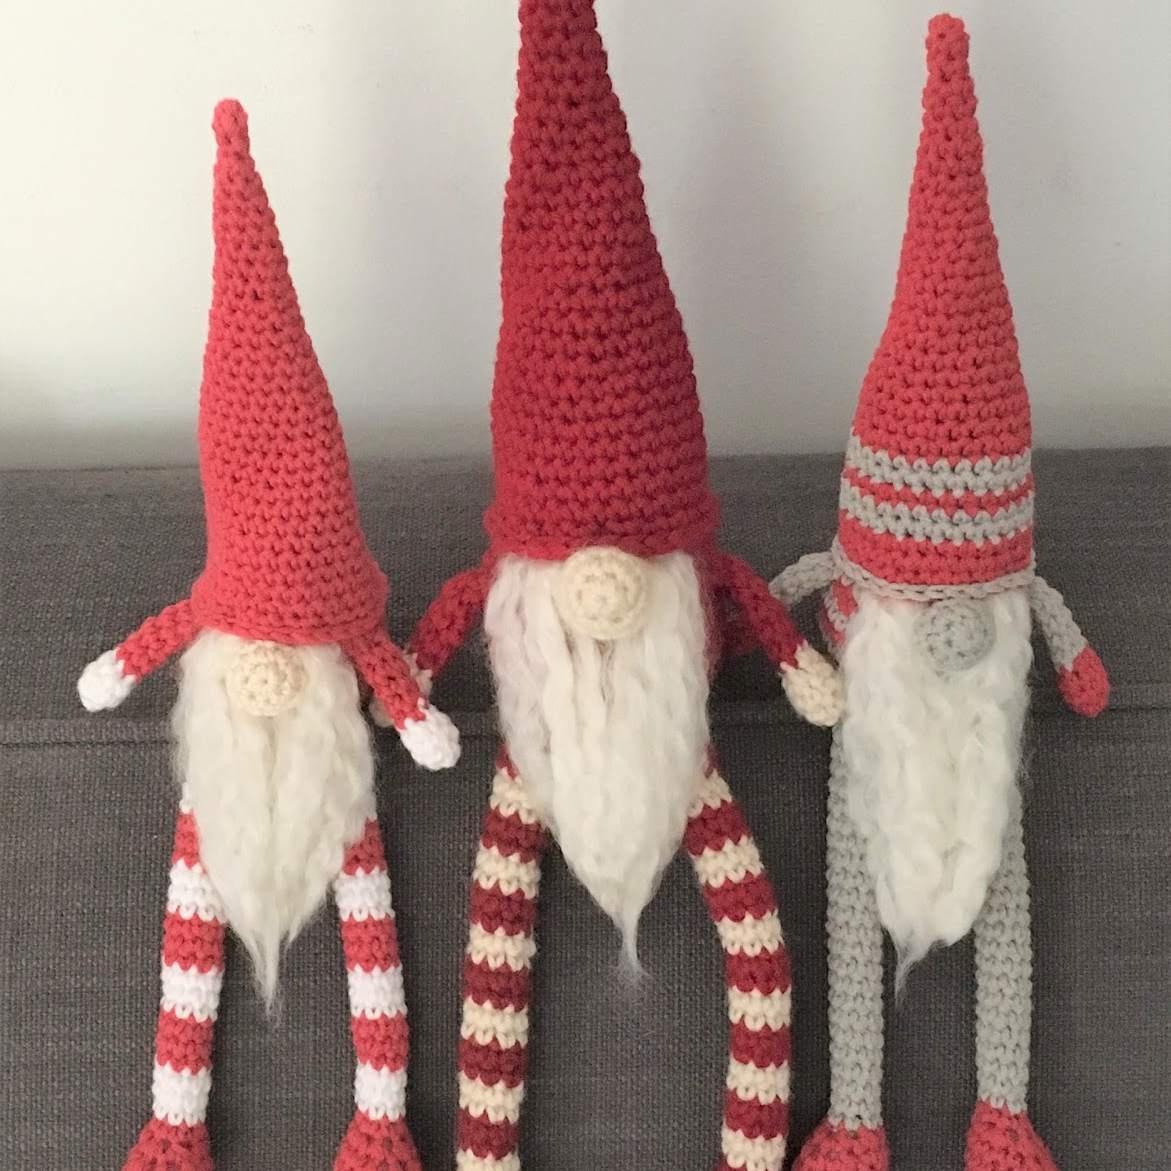 Top 12 Free Christmas Crochet Patterns - Free Printable Christmas Crochet Patterns